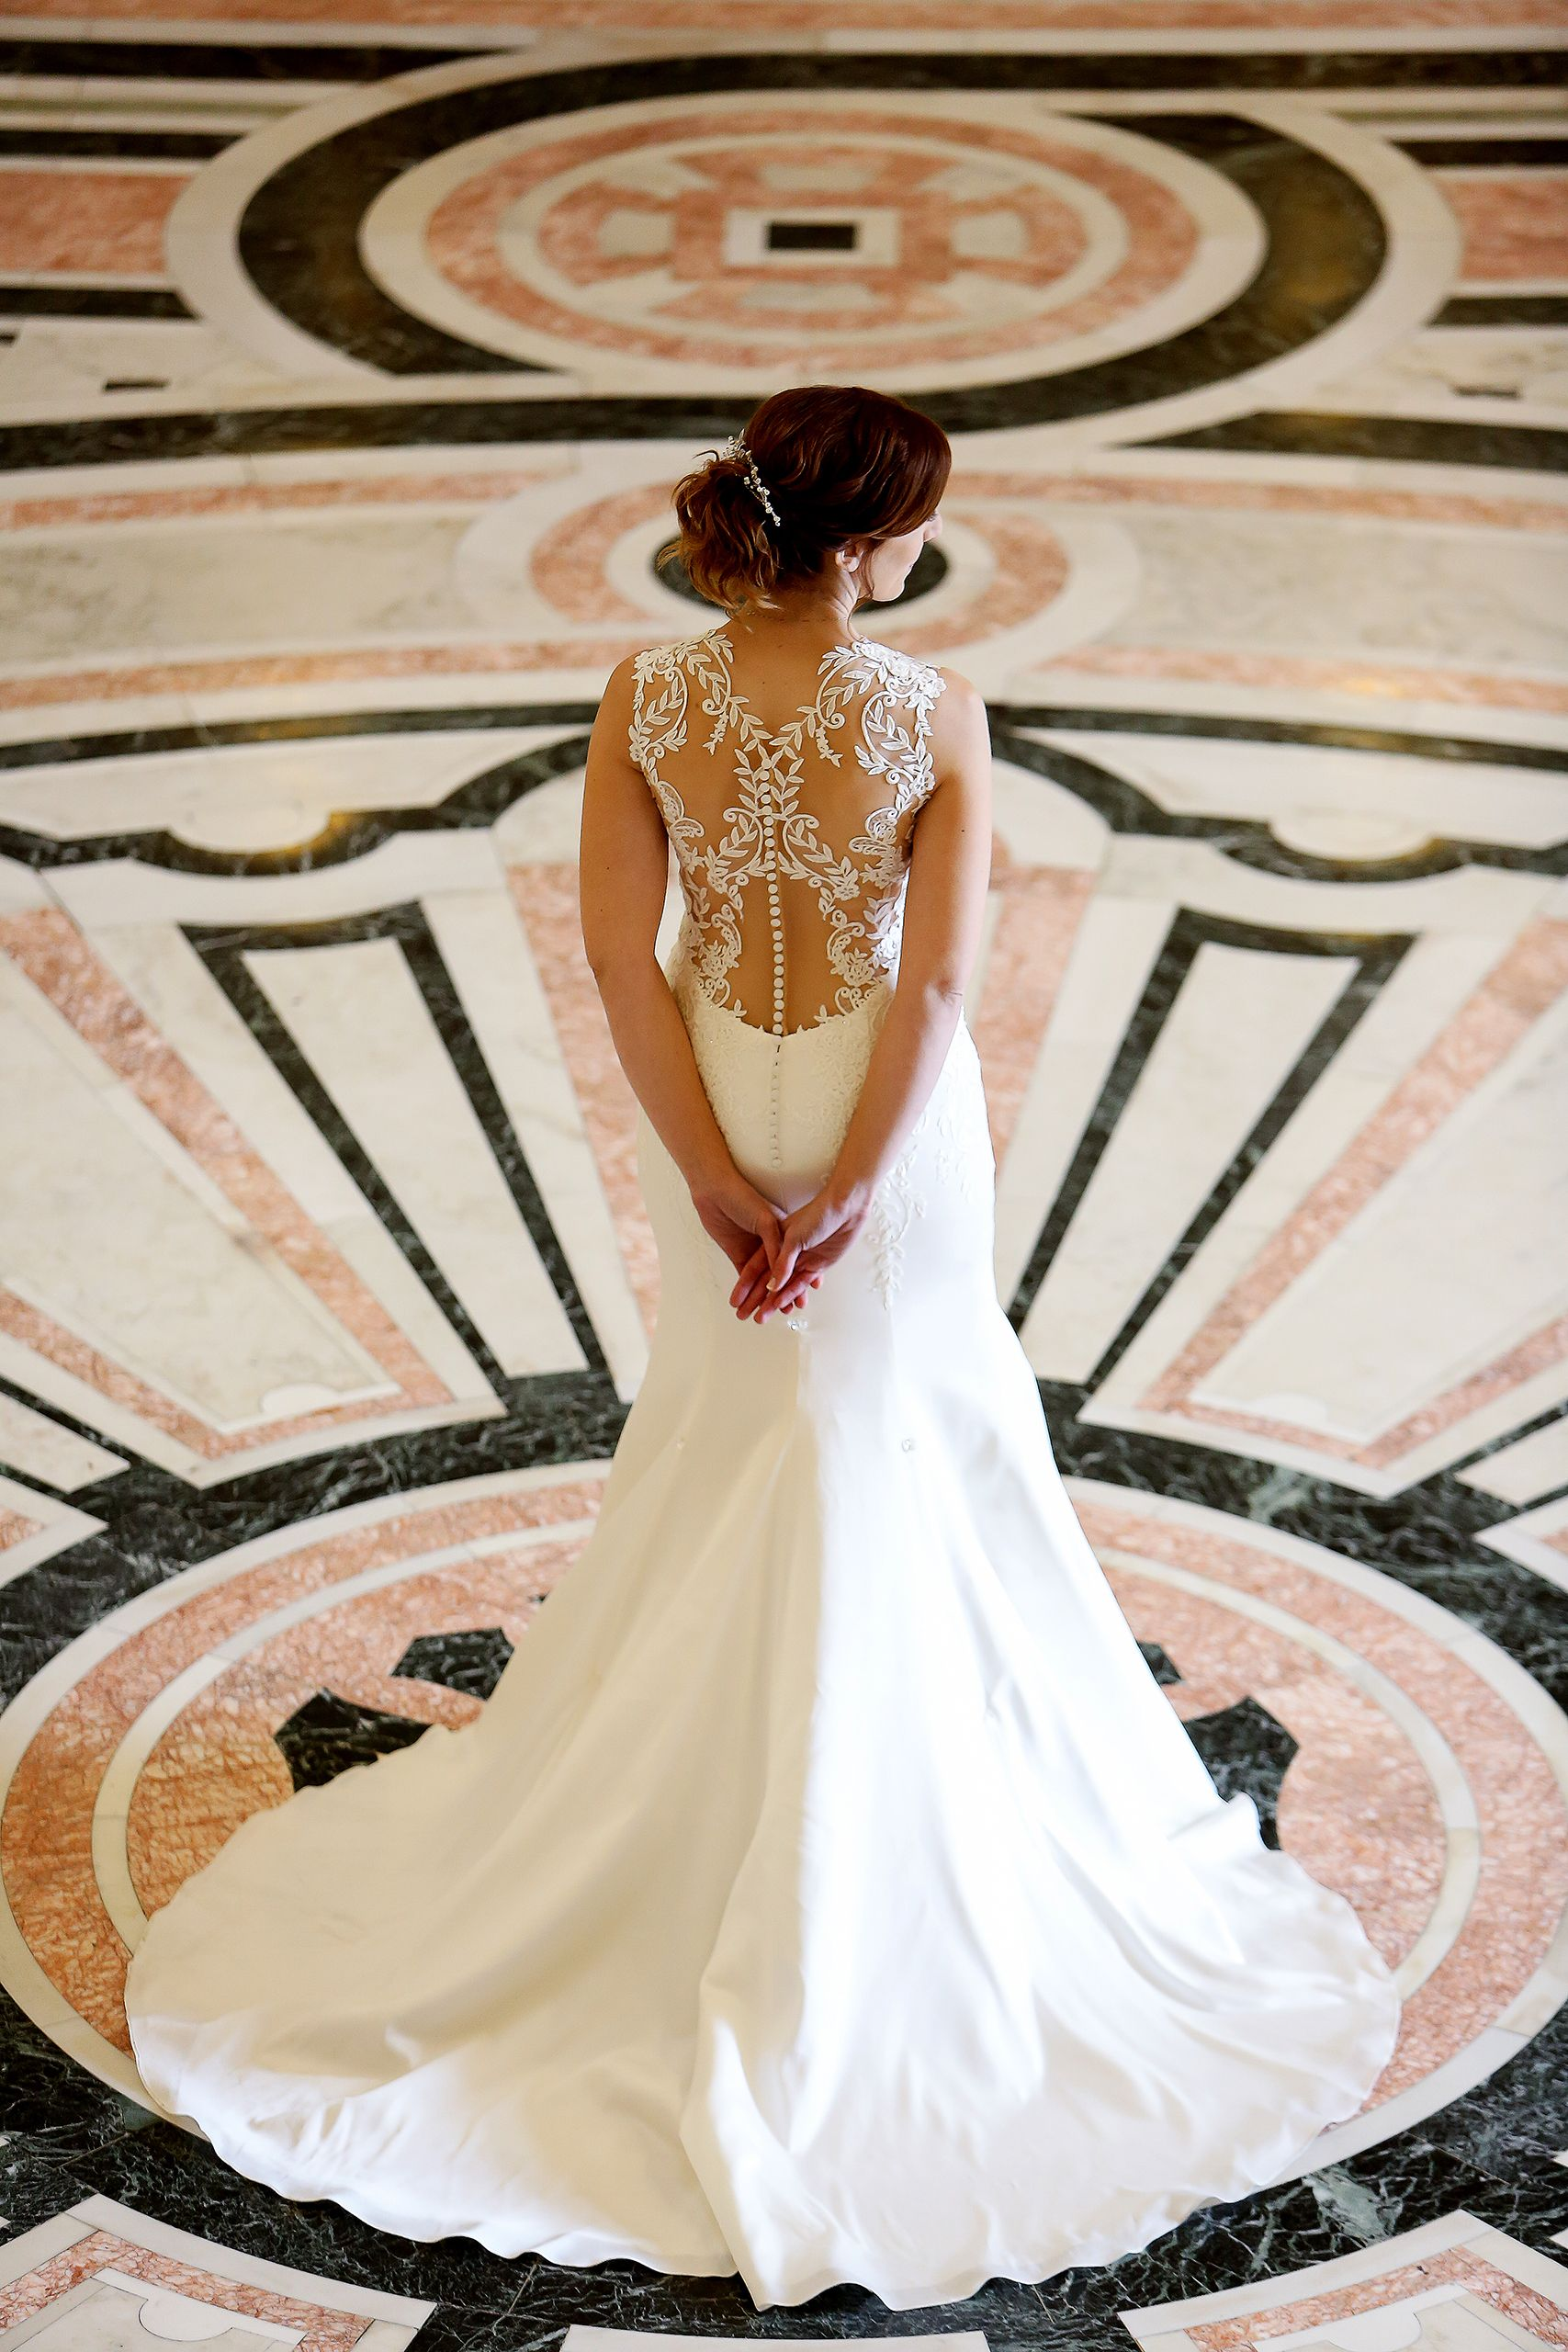 Bride-76.jpg